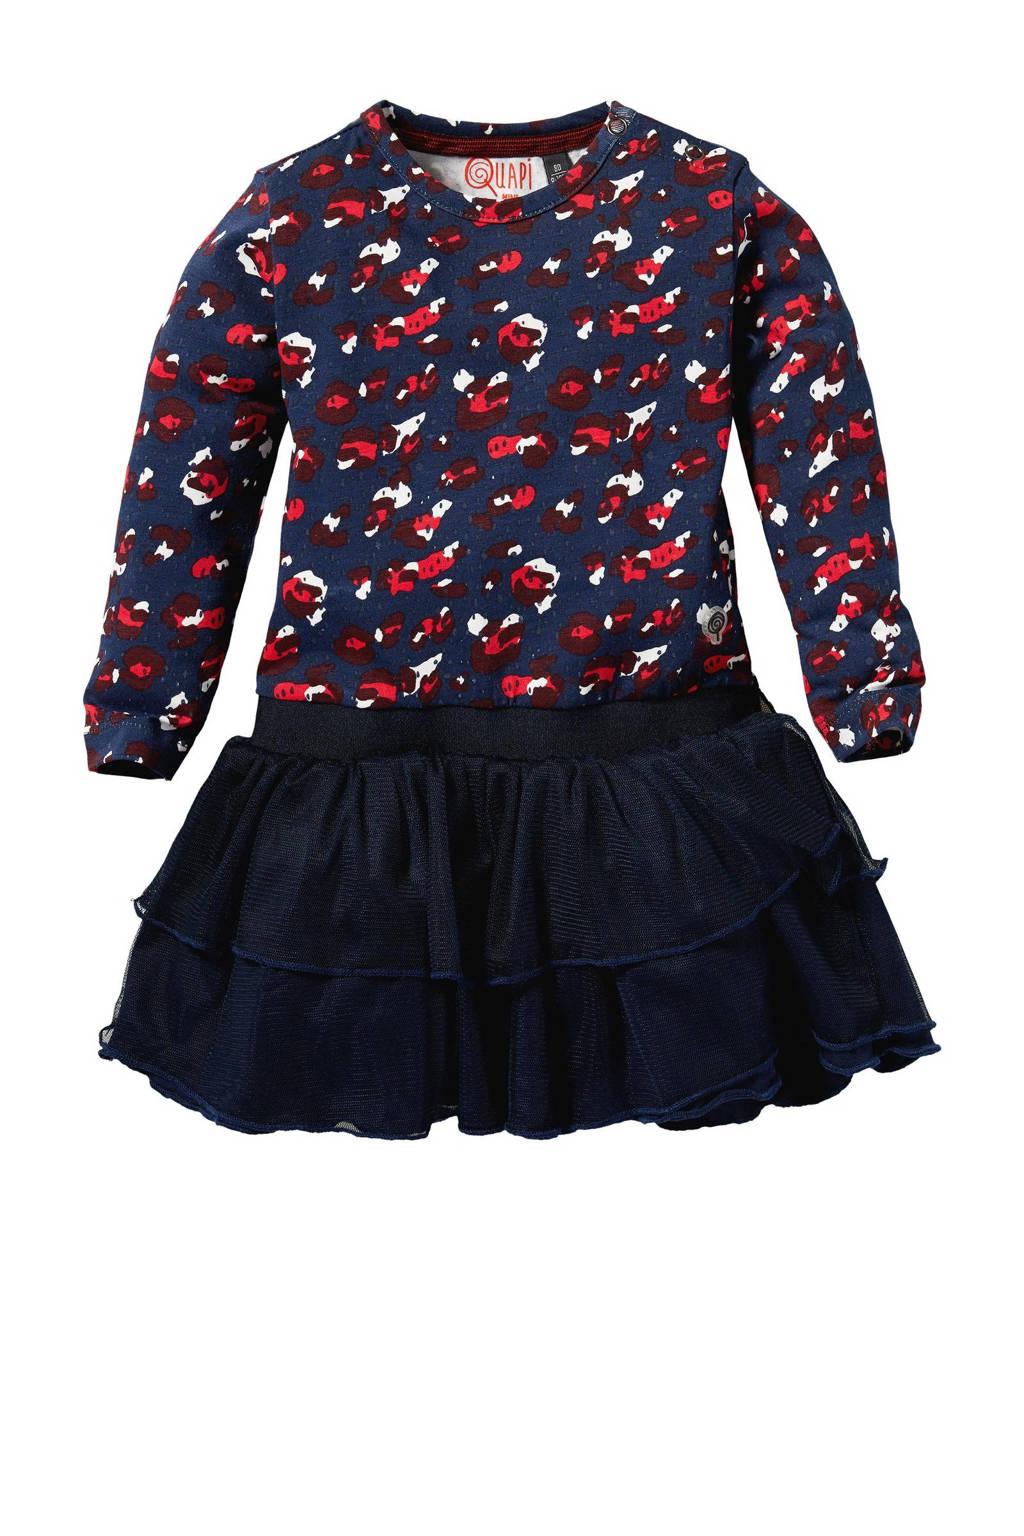 Quapi Mini jurk Laurie met all over print donkerblauw/rood/wit, Donkerblauw/rood/wit